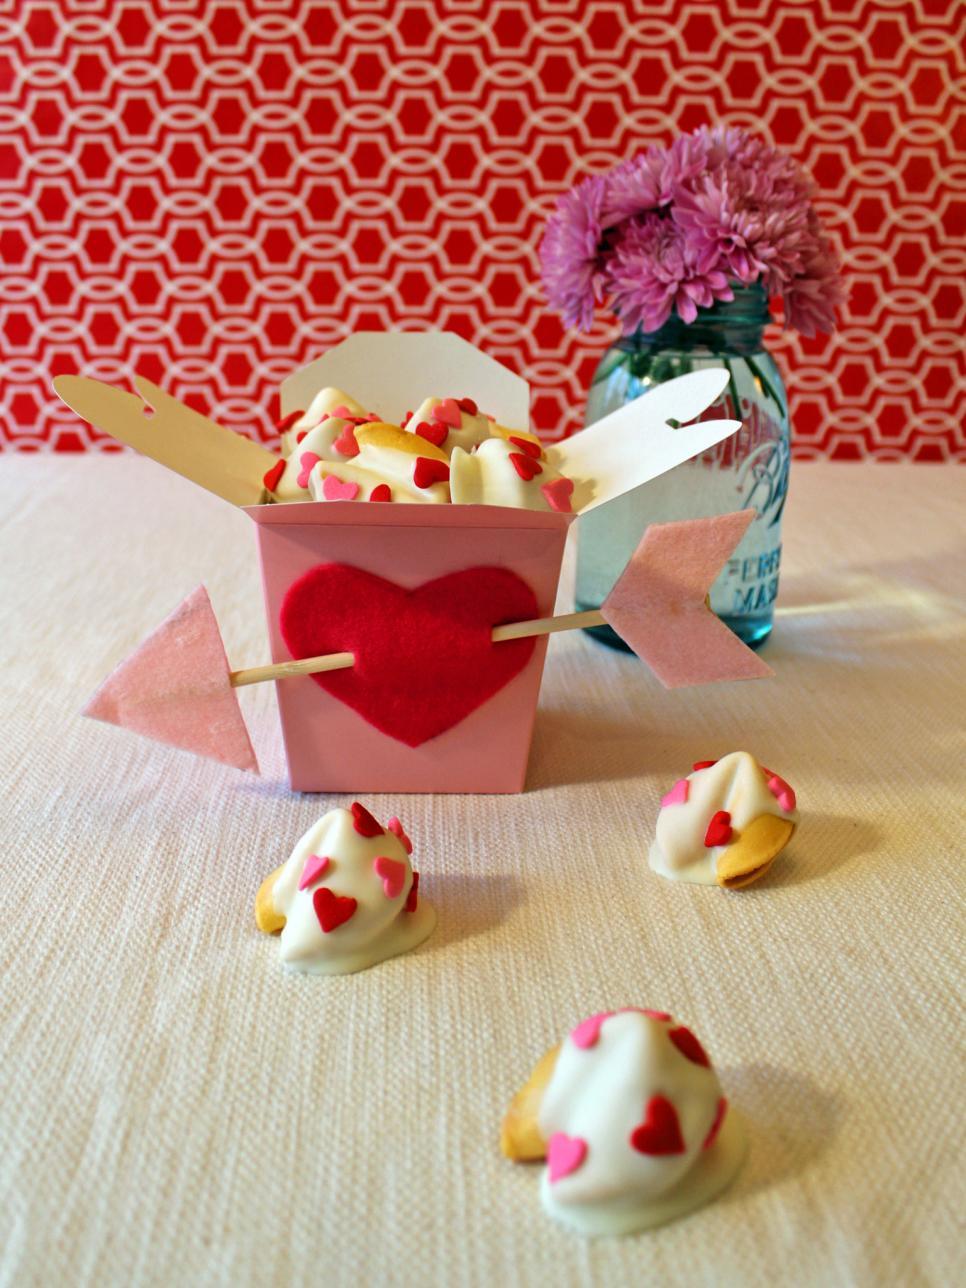 DIY Valentine Gifts | HGTV